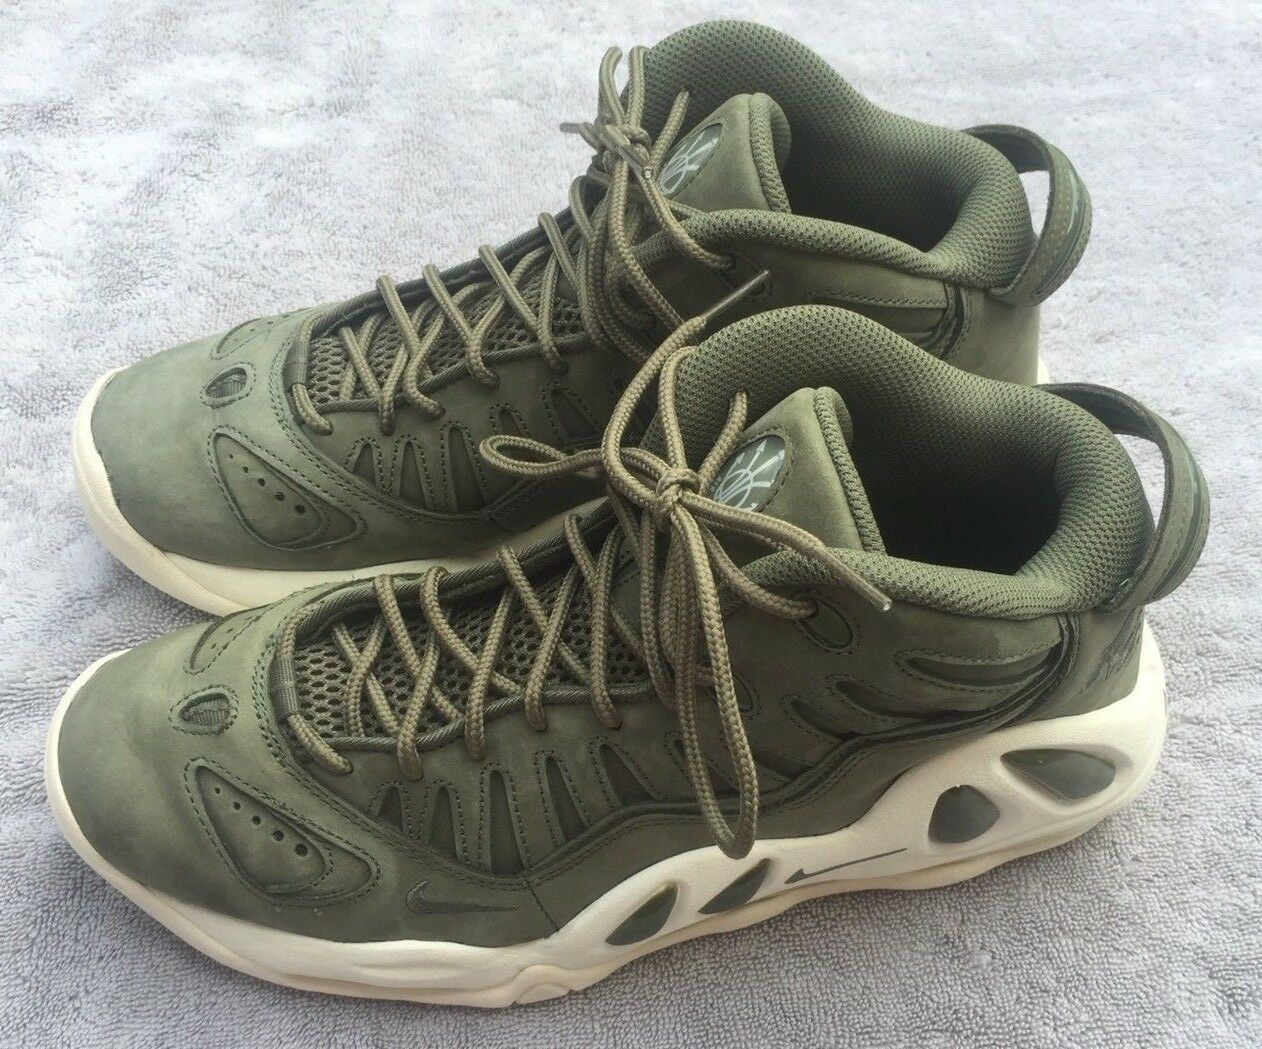 Nike Air Max Uptempo 97 Urban Haze/White Mens Size 10 (399207300) Scottie Pippen